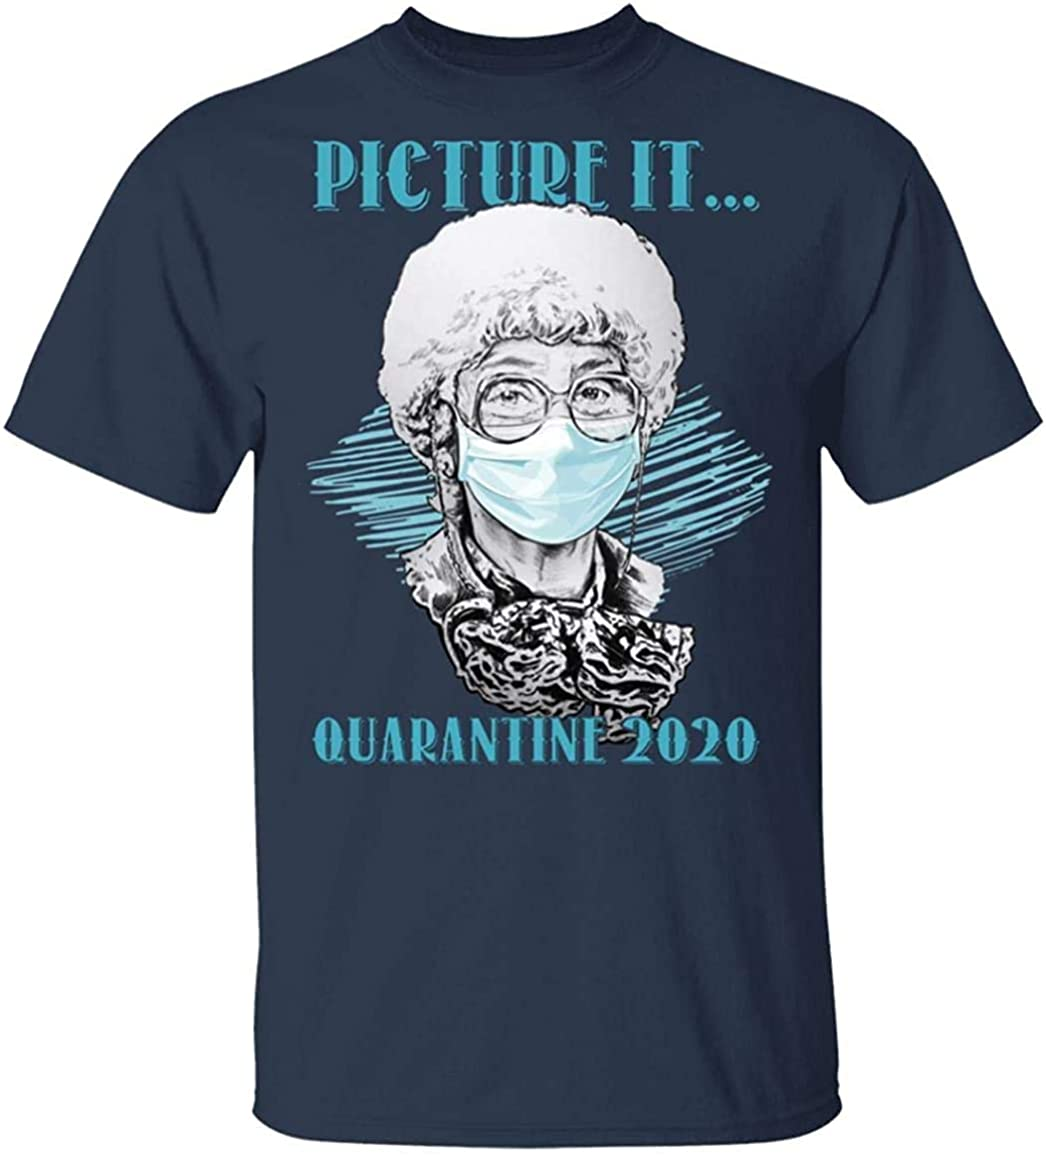 Funny Golden Girls Movie Shirt UNIYI Picture It Quarantine 2020 Sophia Golden Girls T-Shirt